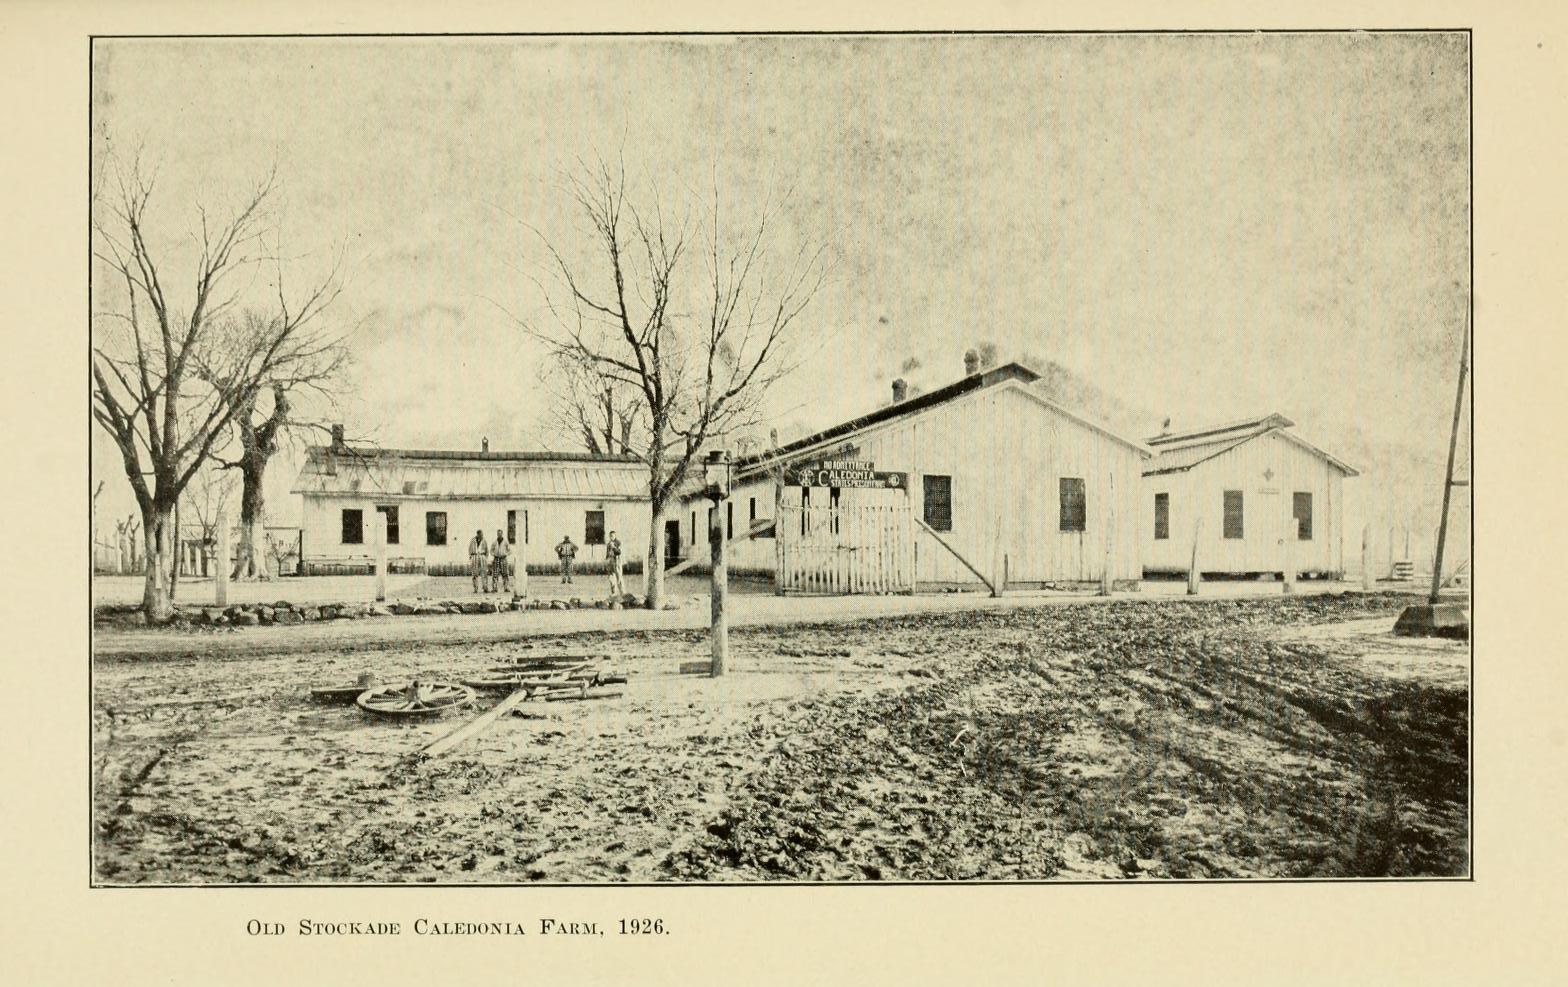 University of North Carolina at Chapel Hill Archives - Page 28 of 34 ...